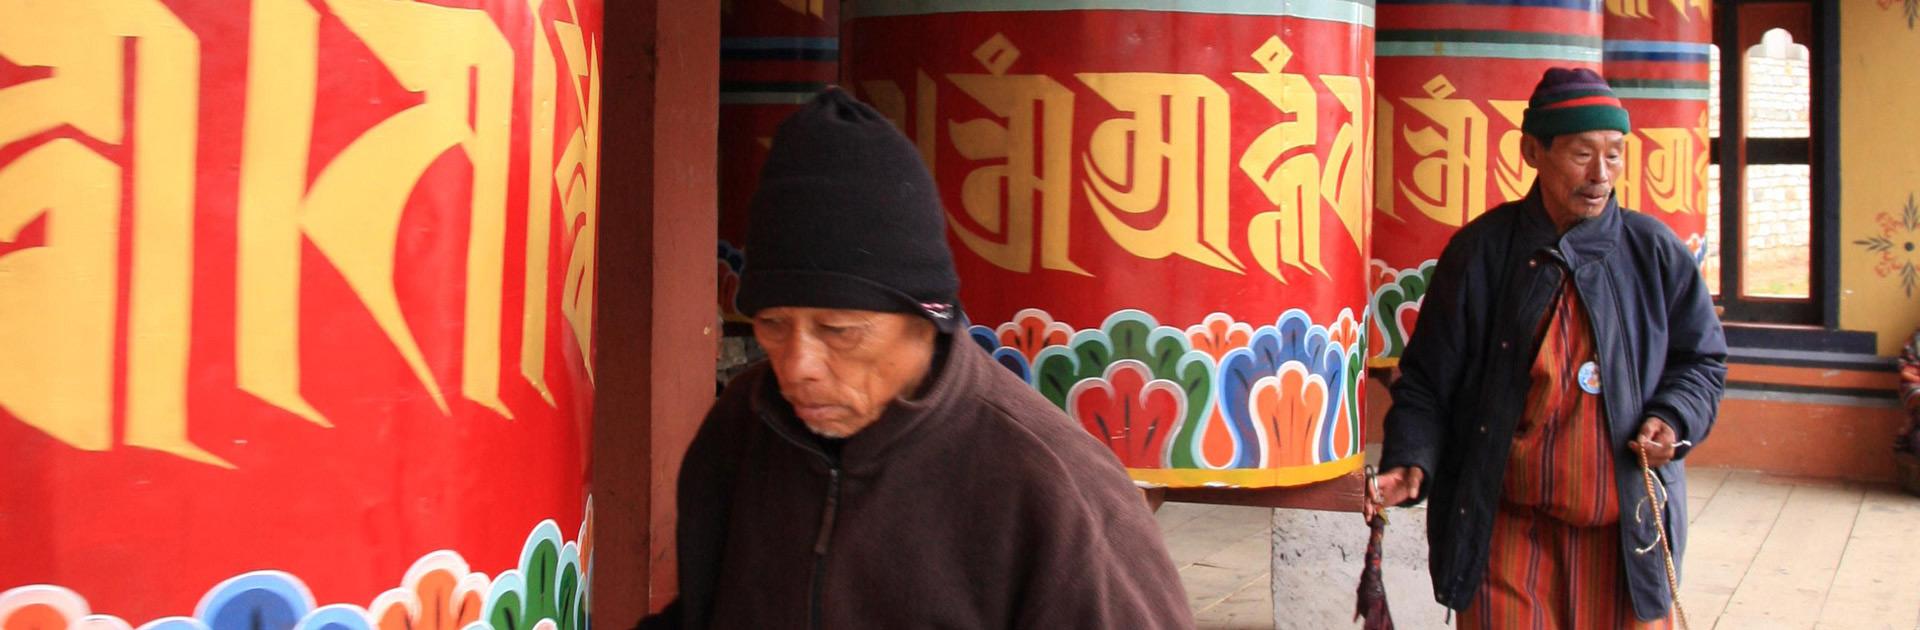 BT Bután al Completo 10 días 2